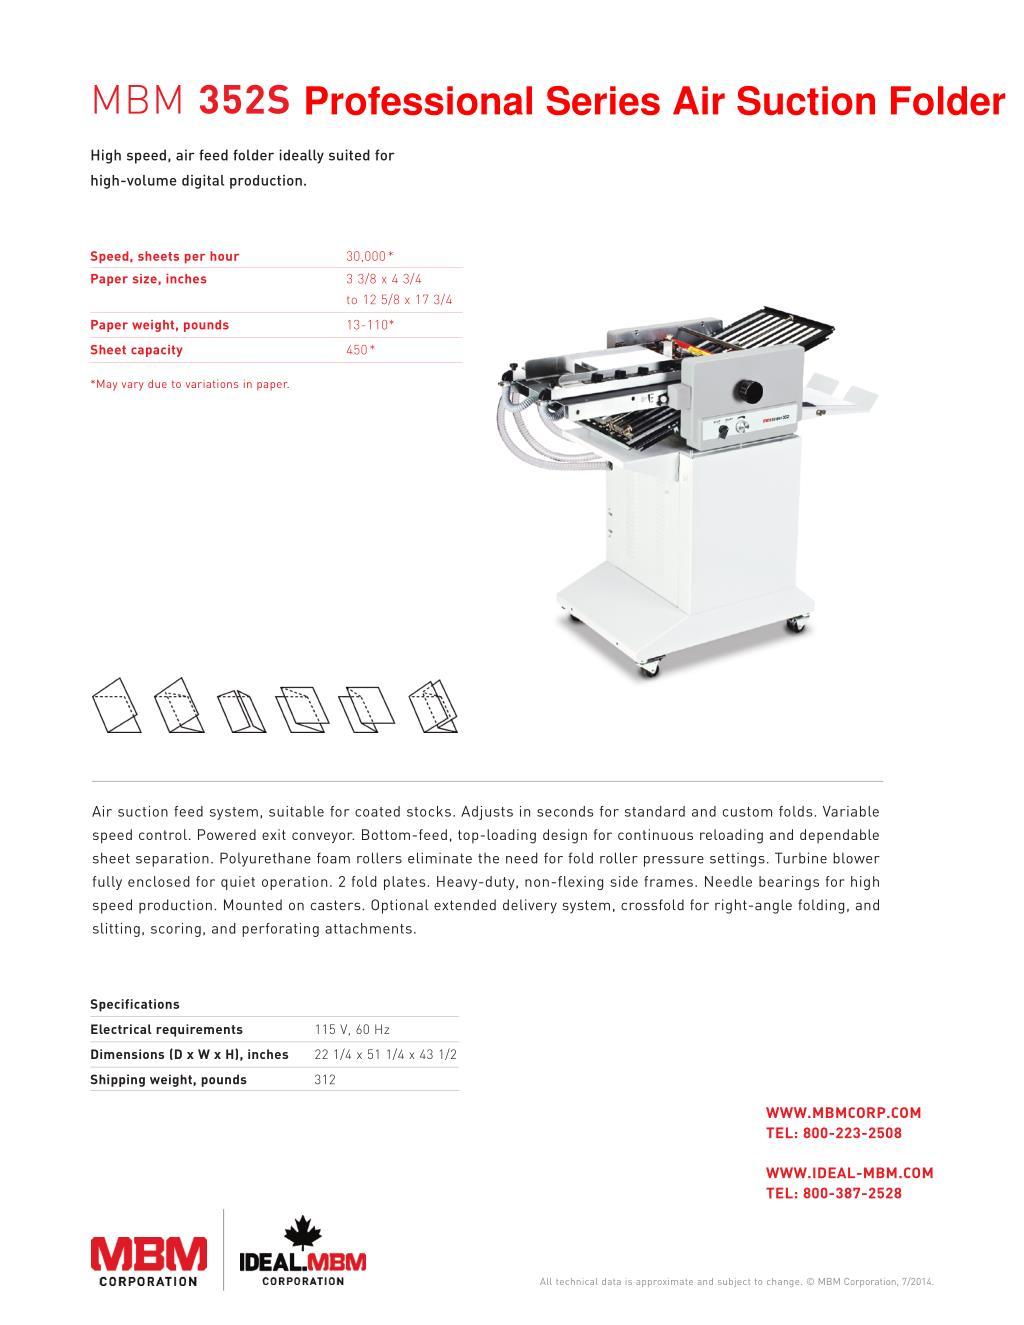 PPT - MBM 352S Professional Series Air Suction Folder - Printfinish